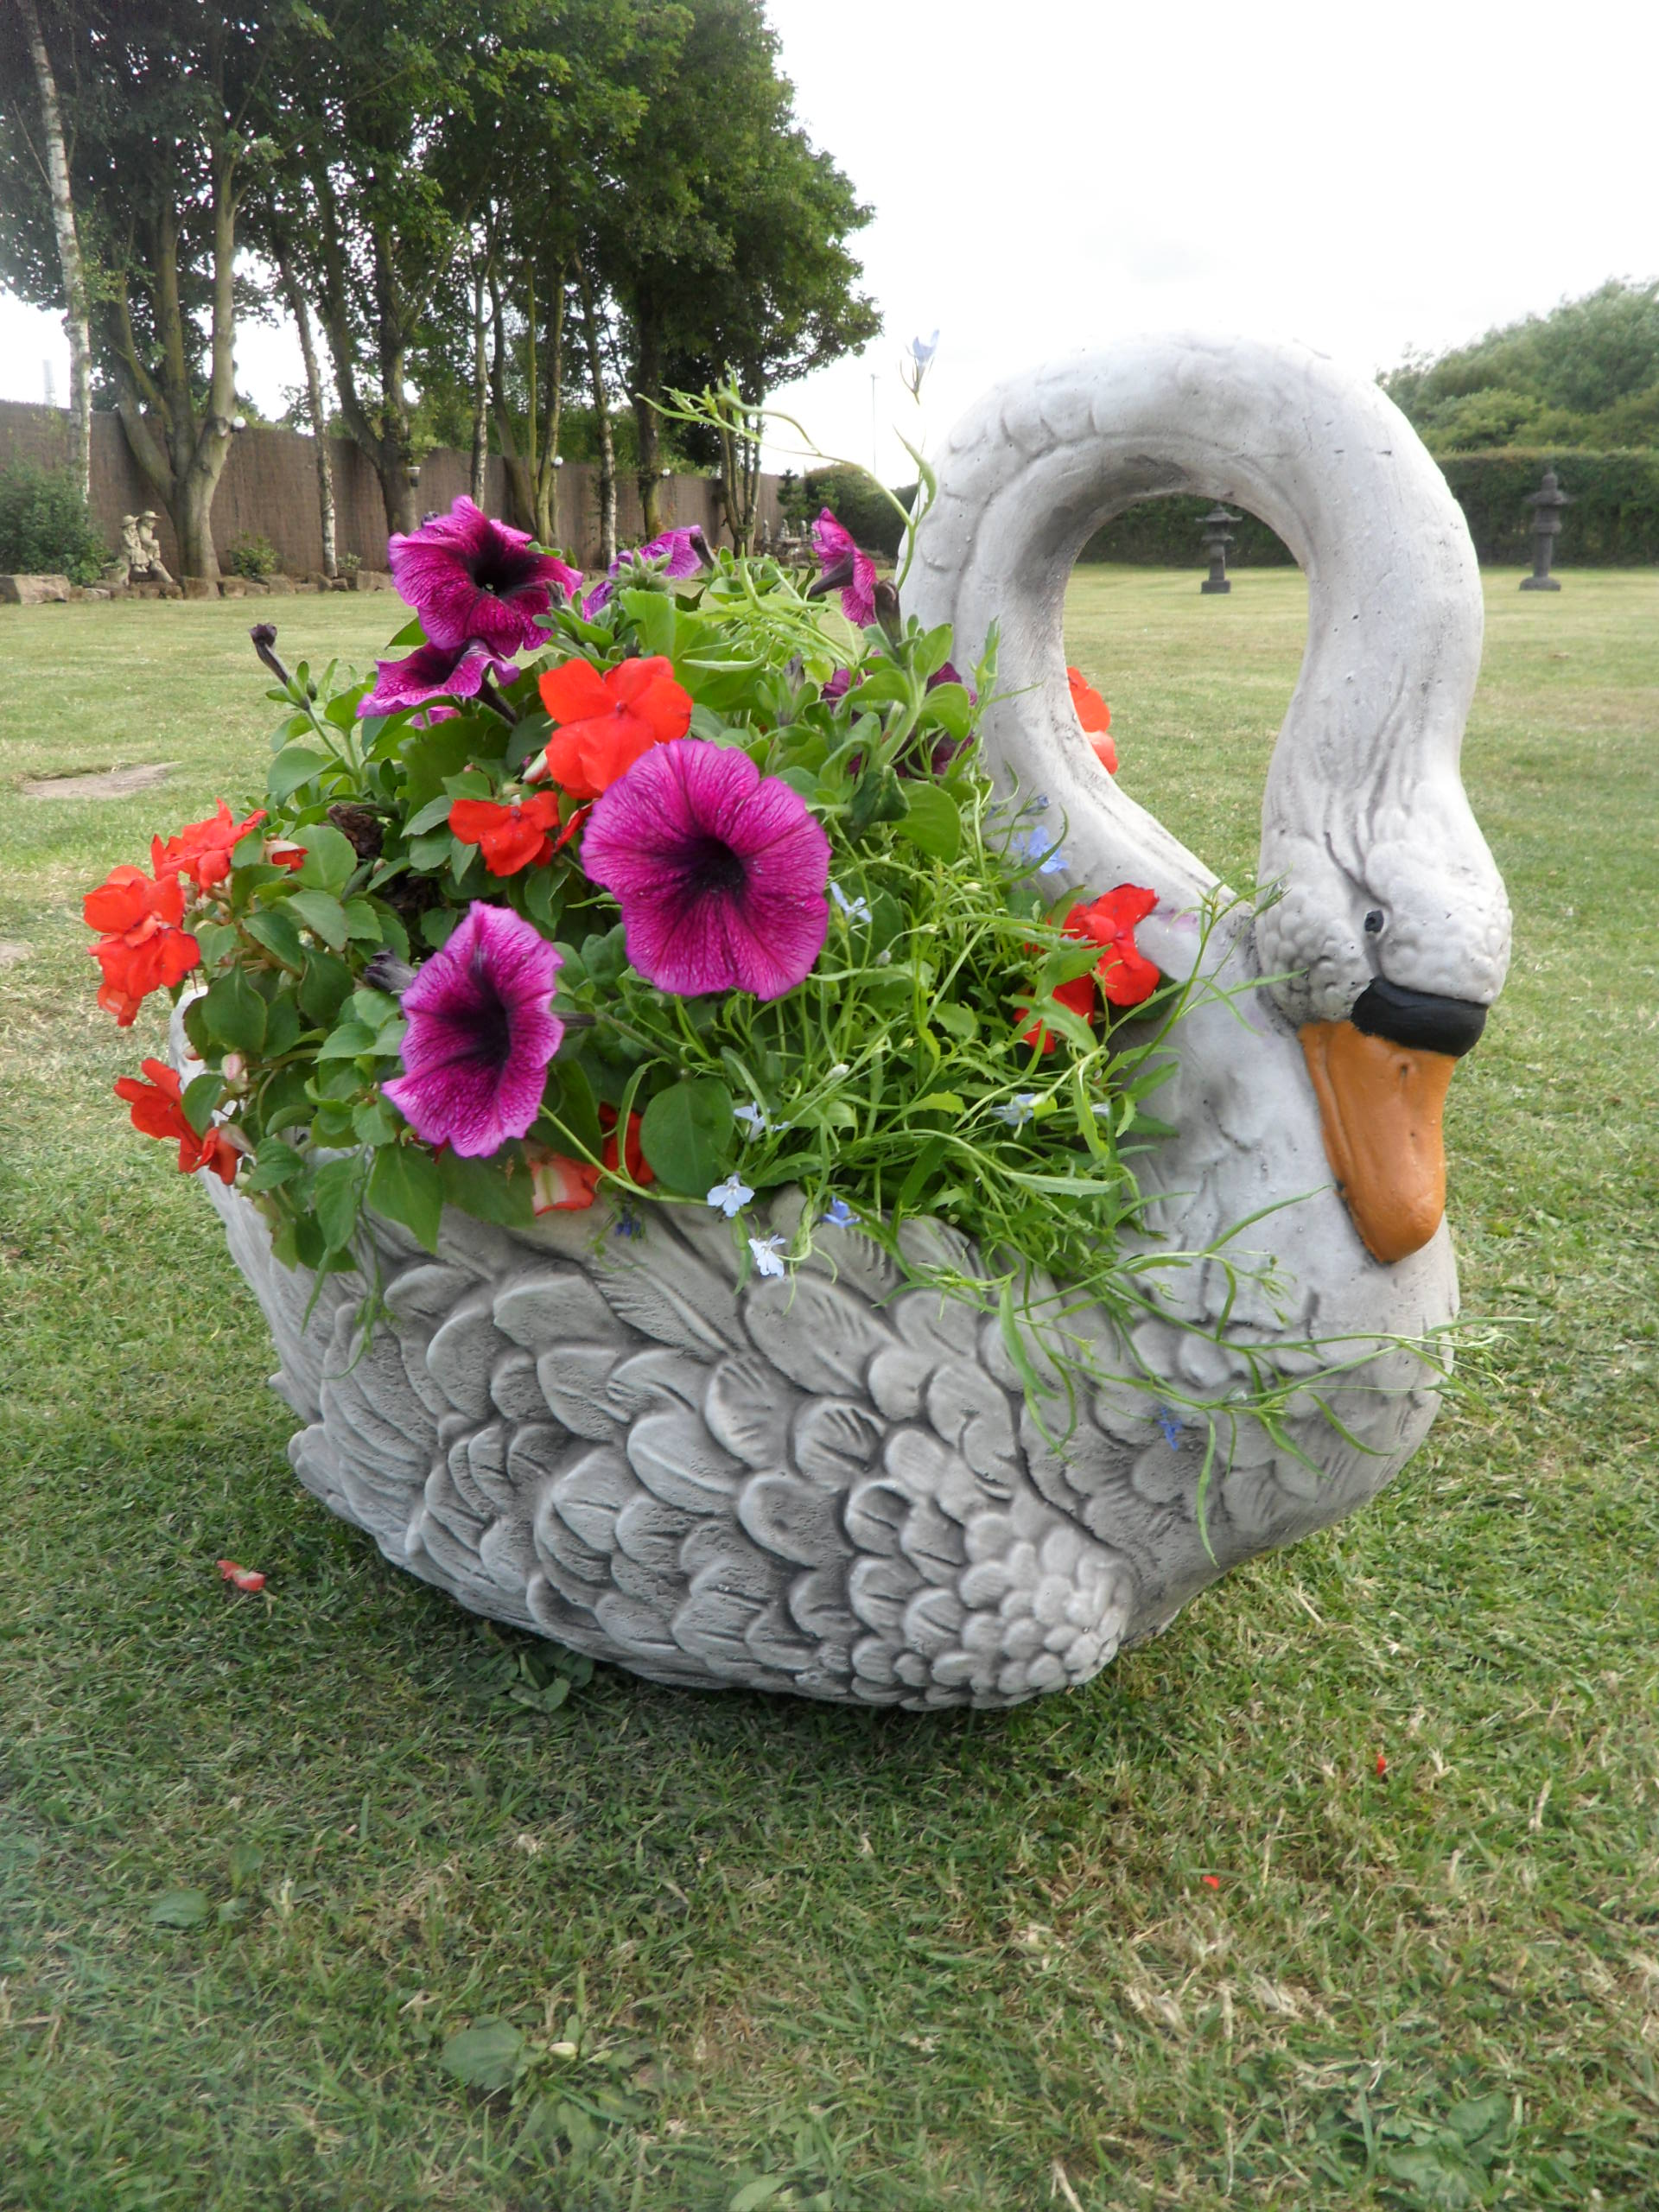 Garden ornaments an unhealthy obsession pt 1 dj emma peel